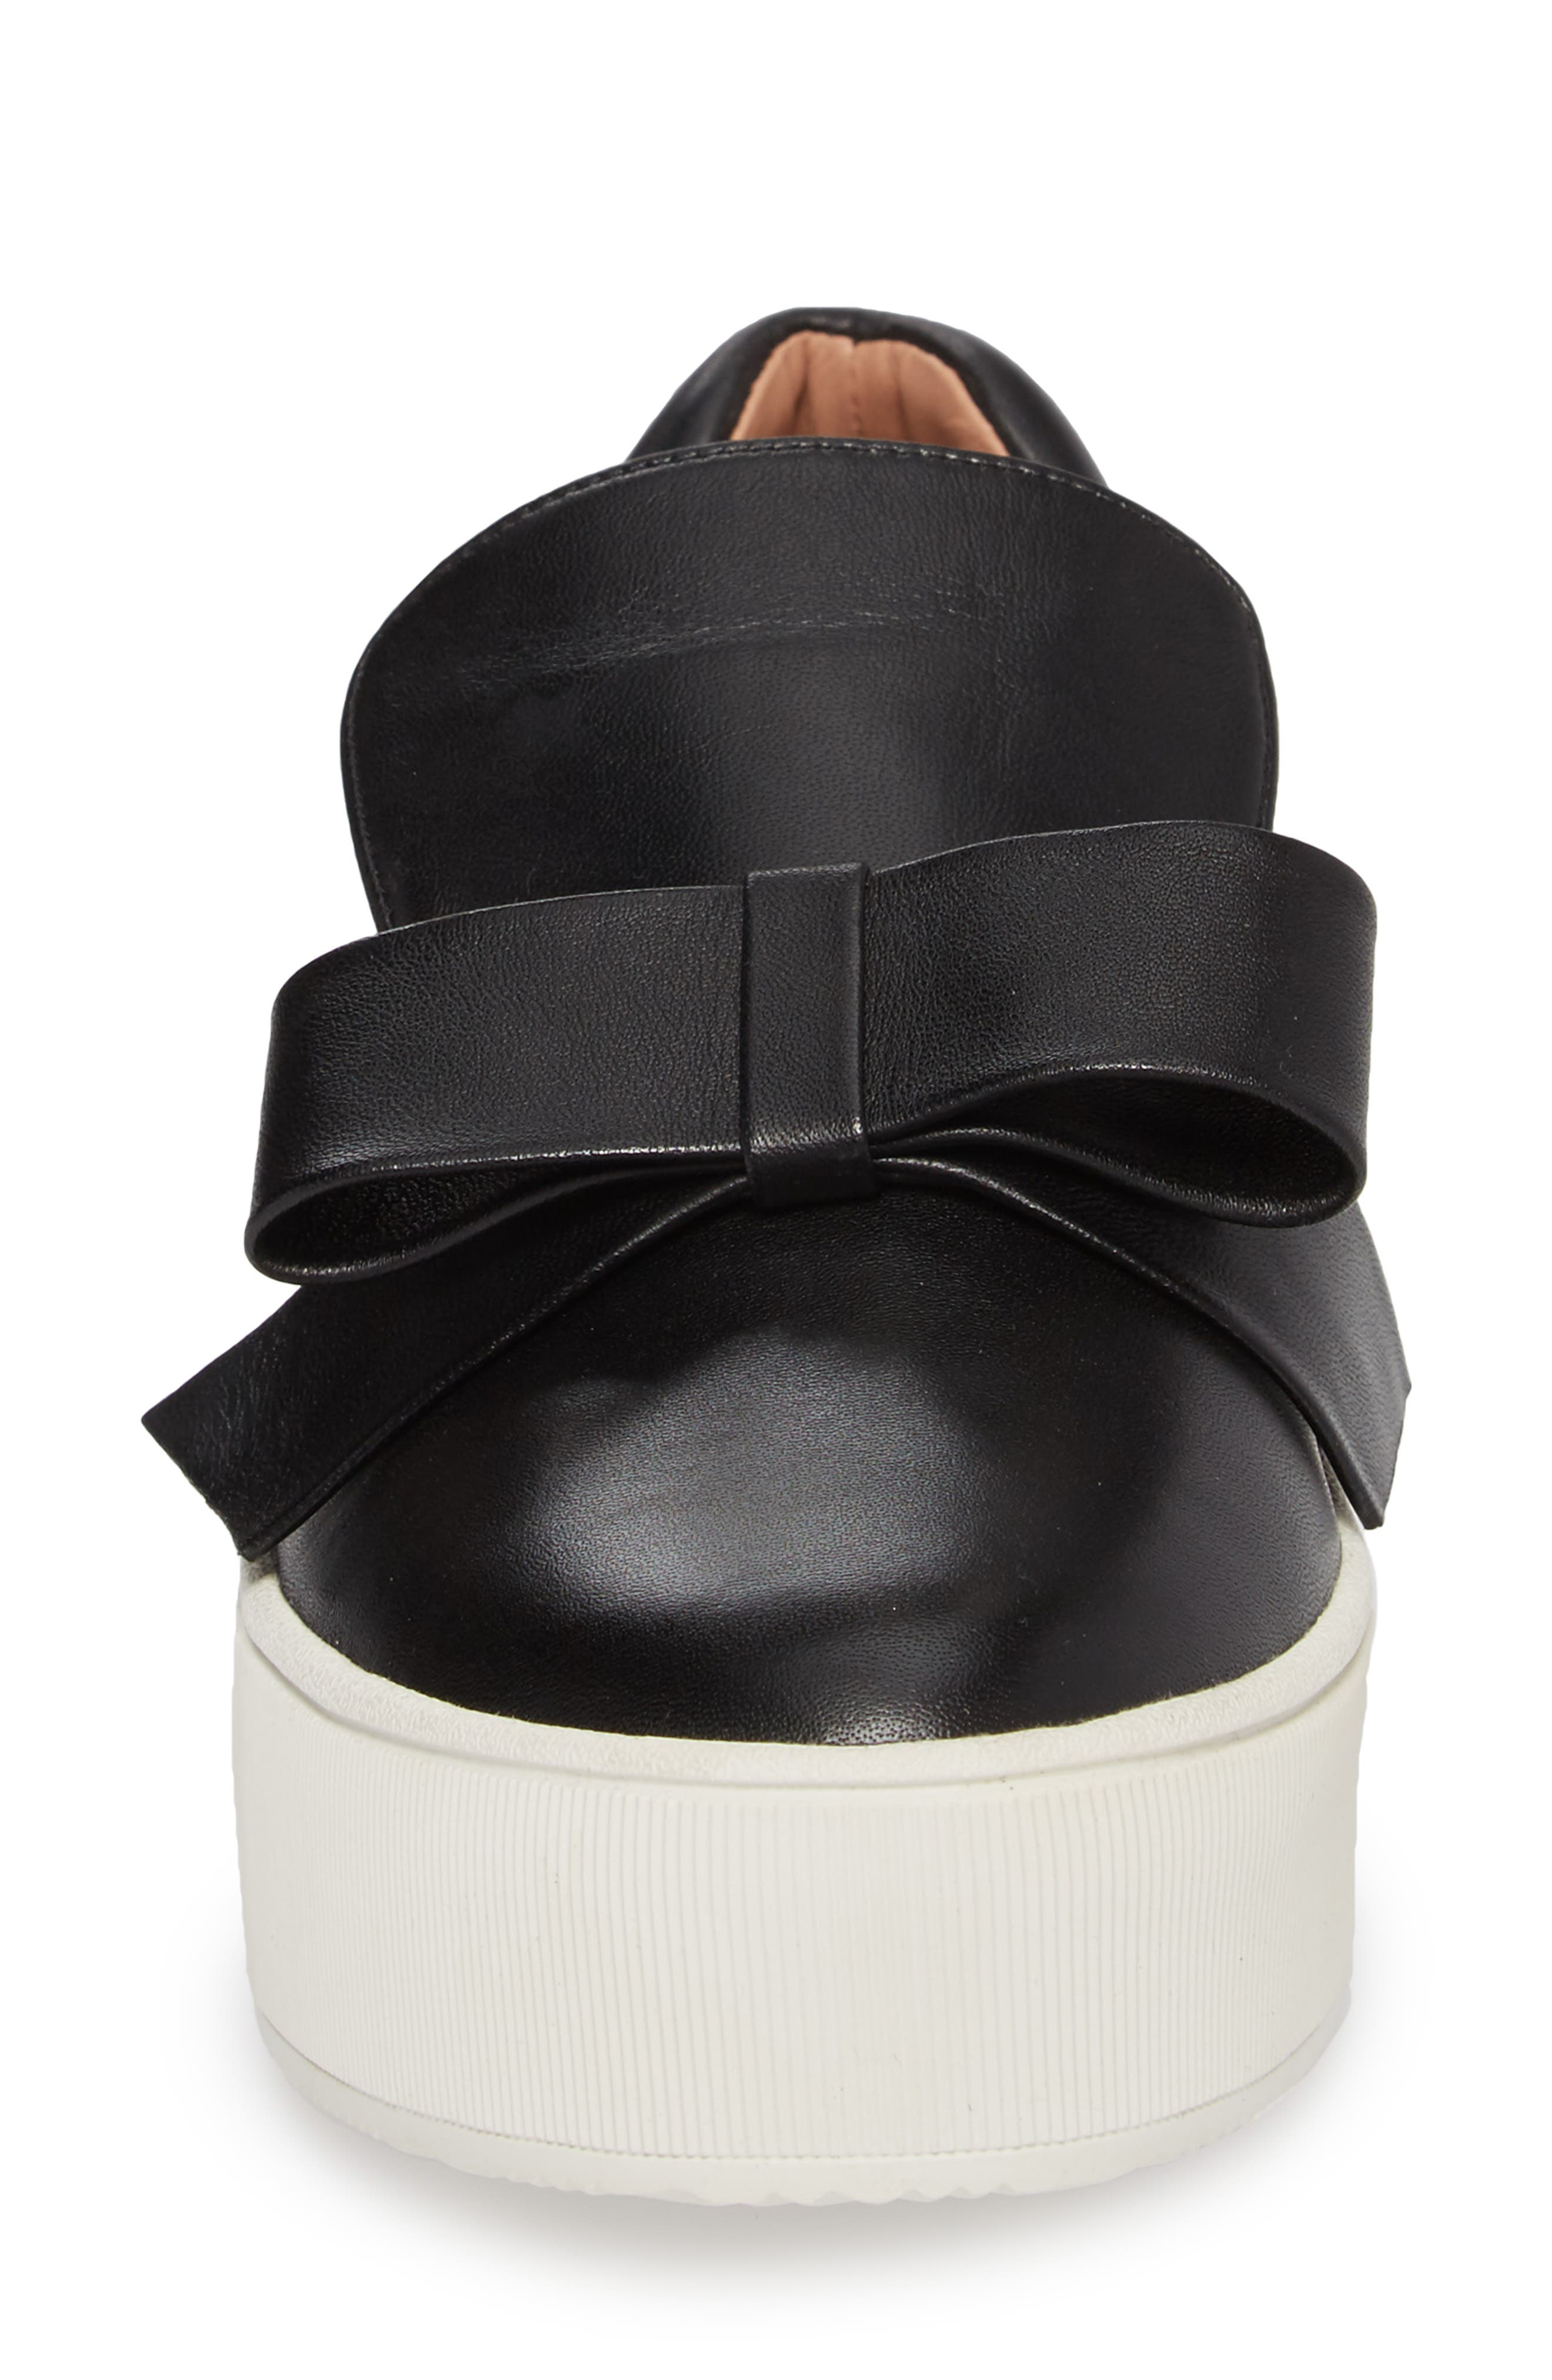 Vania Bow Platform Sneaker,                             Alternate thumbnail 4, color,                             Black Leather